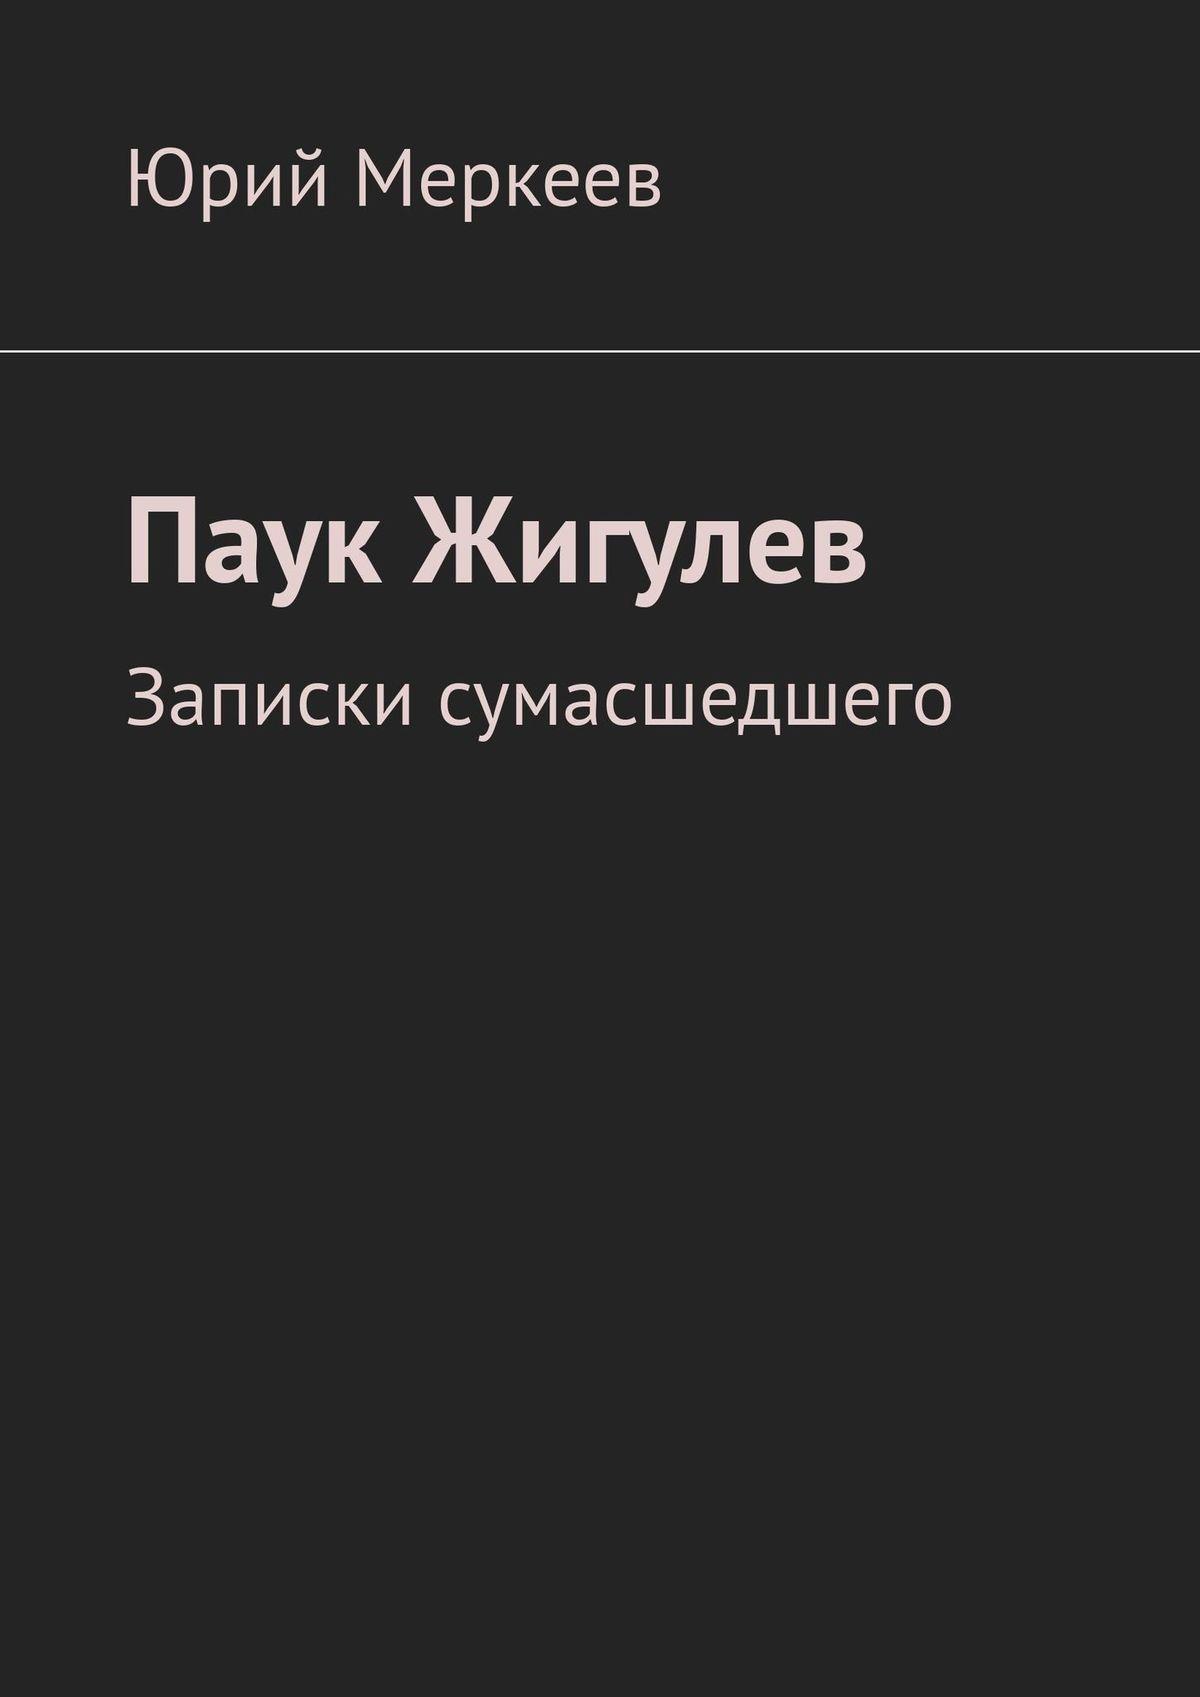 Фото - Юрий Меркеев Паук Жигулев. Записки сумасшедшего юрий меркеев монастырь икошка